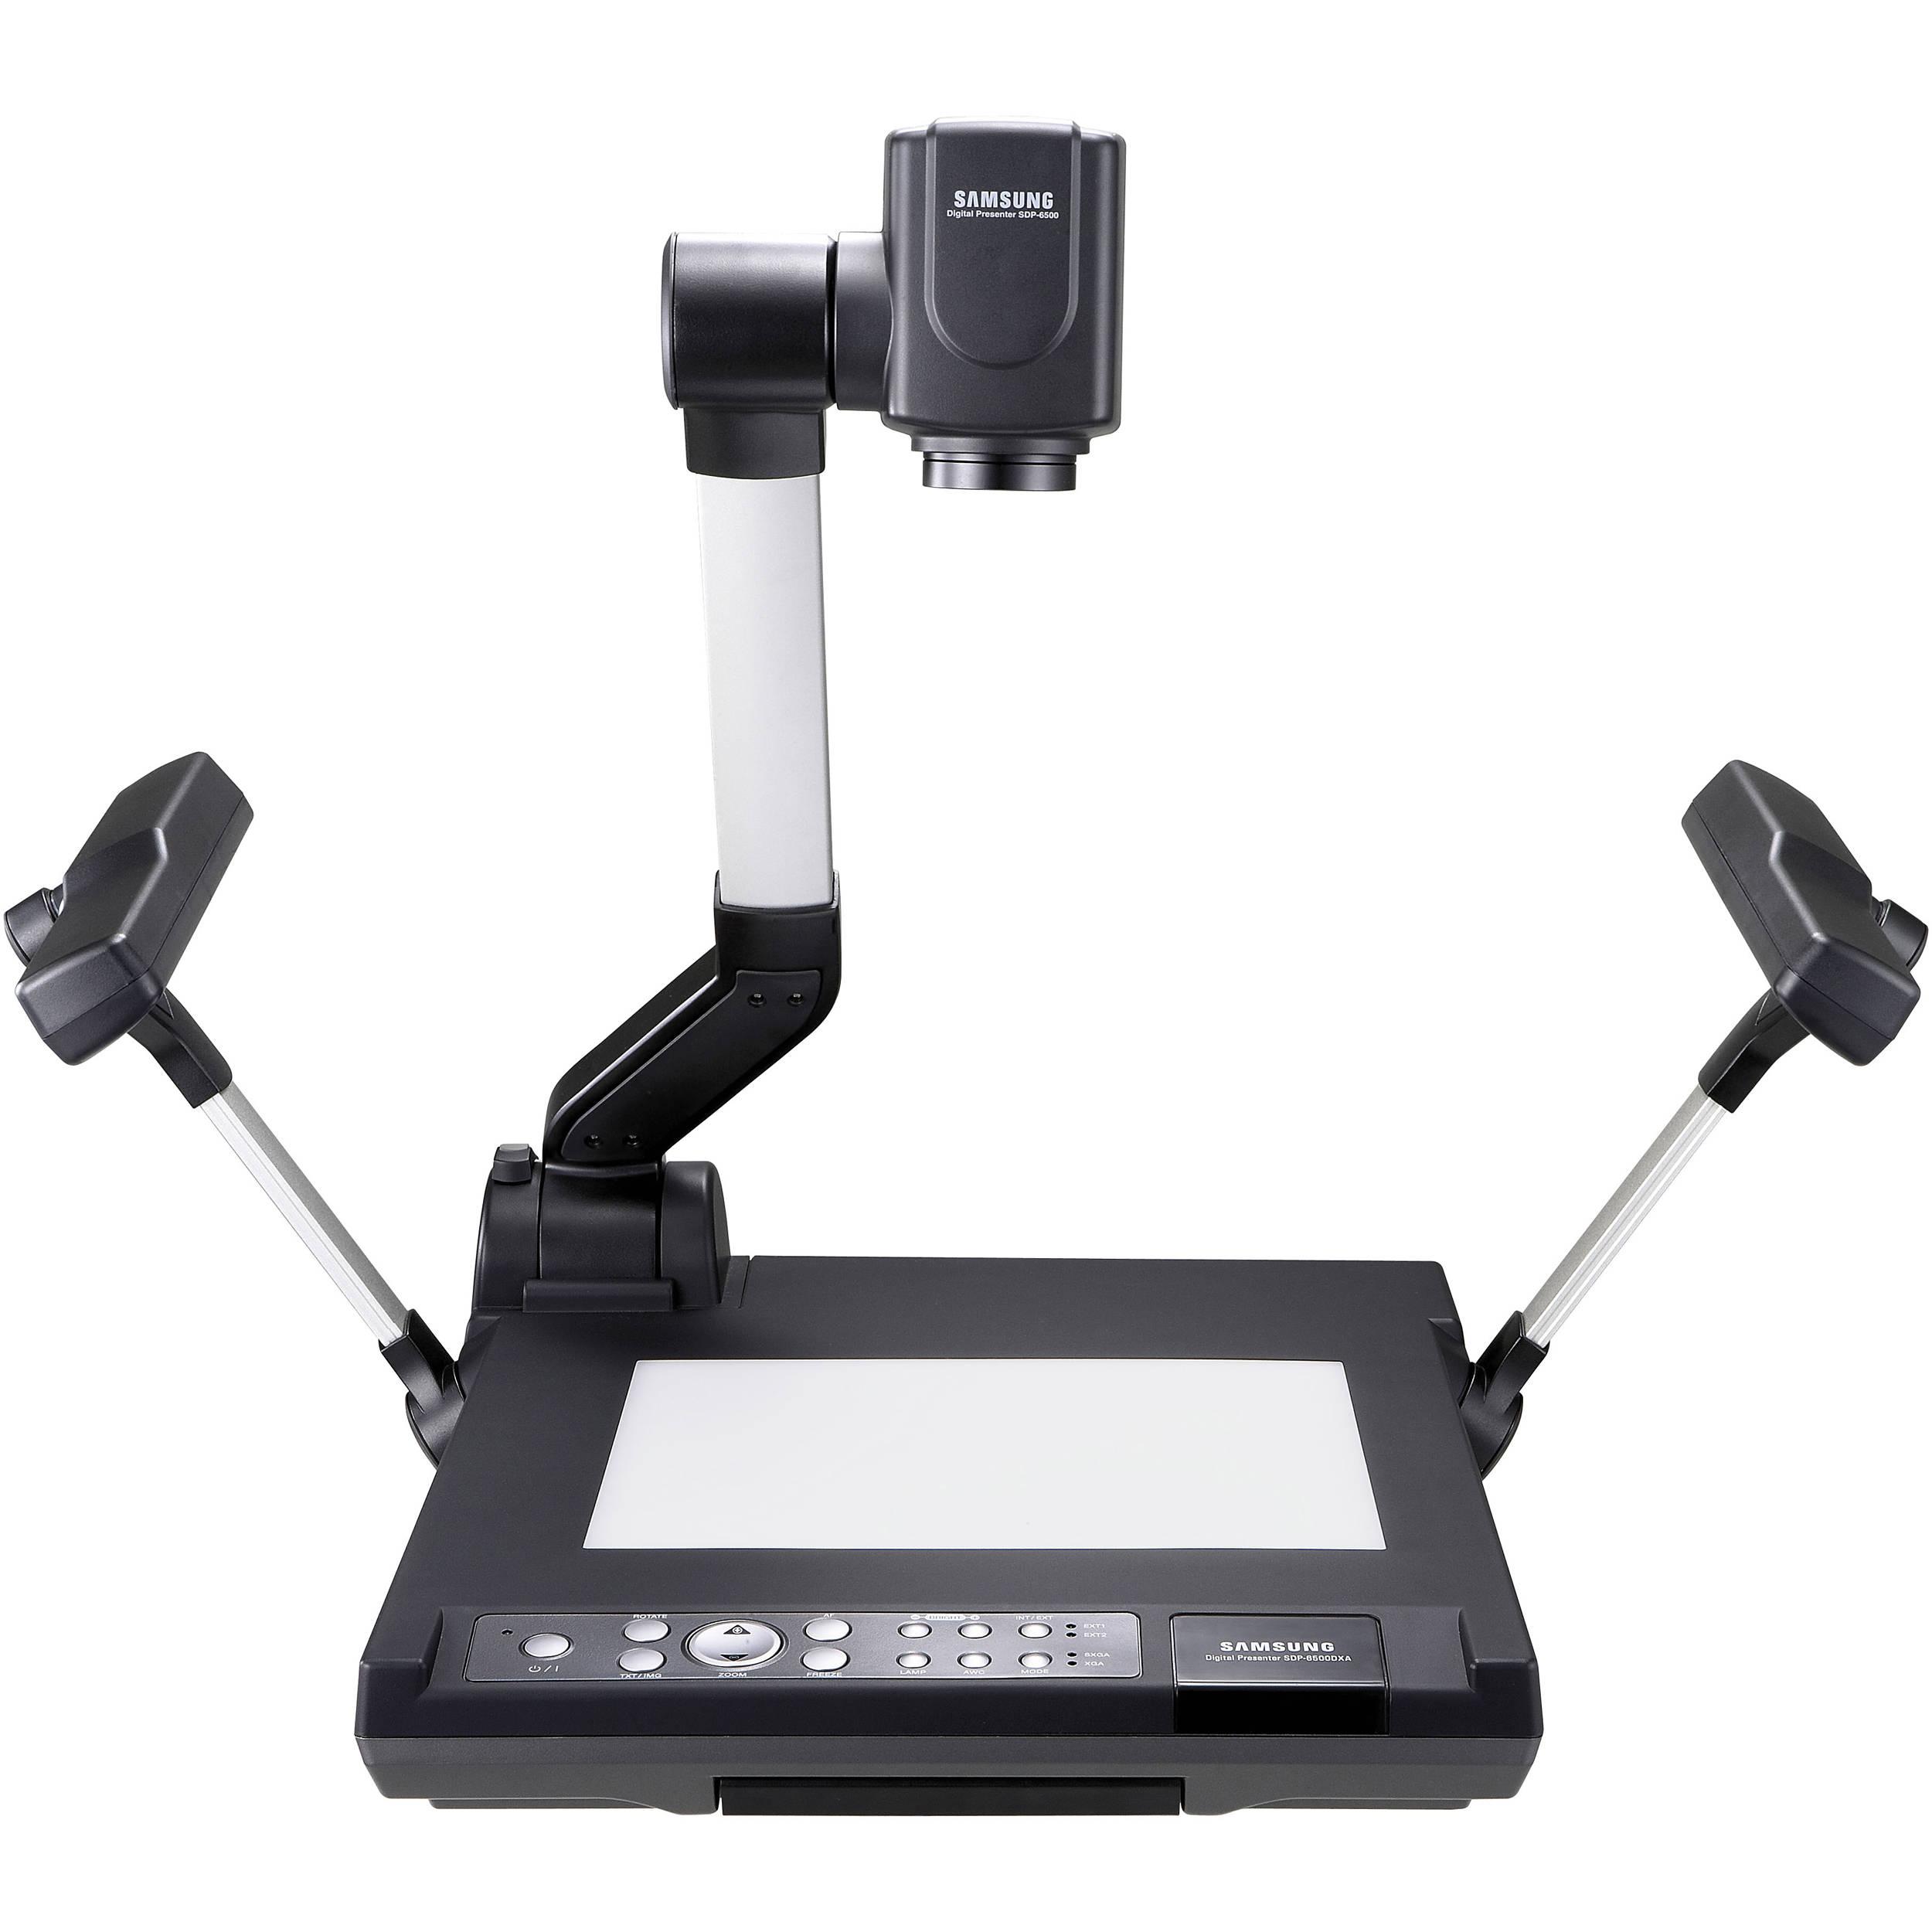 Samsung SDP-6500DXA High Resolution Digital Presenter, SXGA, 12x Optical  Zoom Lens, Built-In Lights